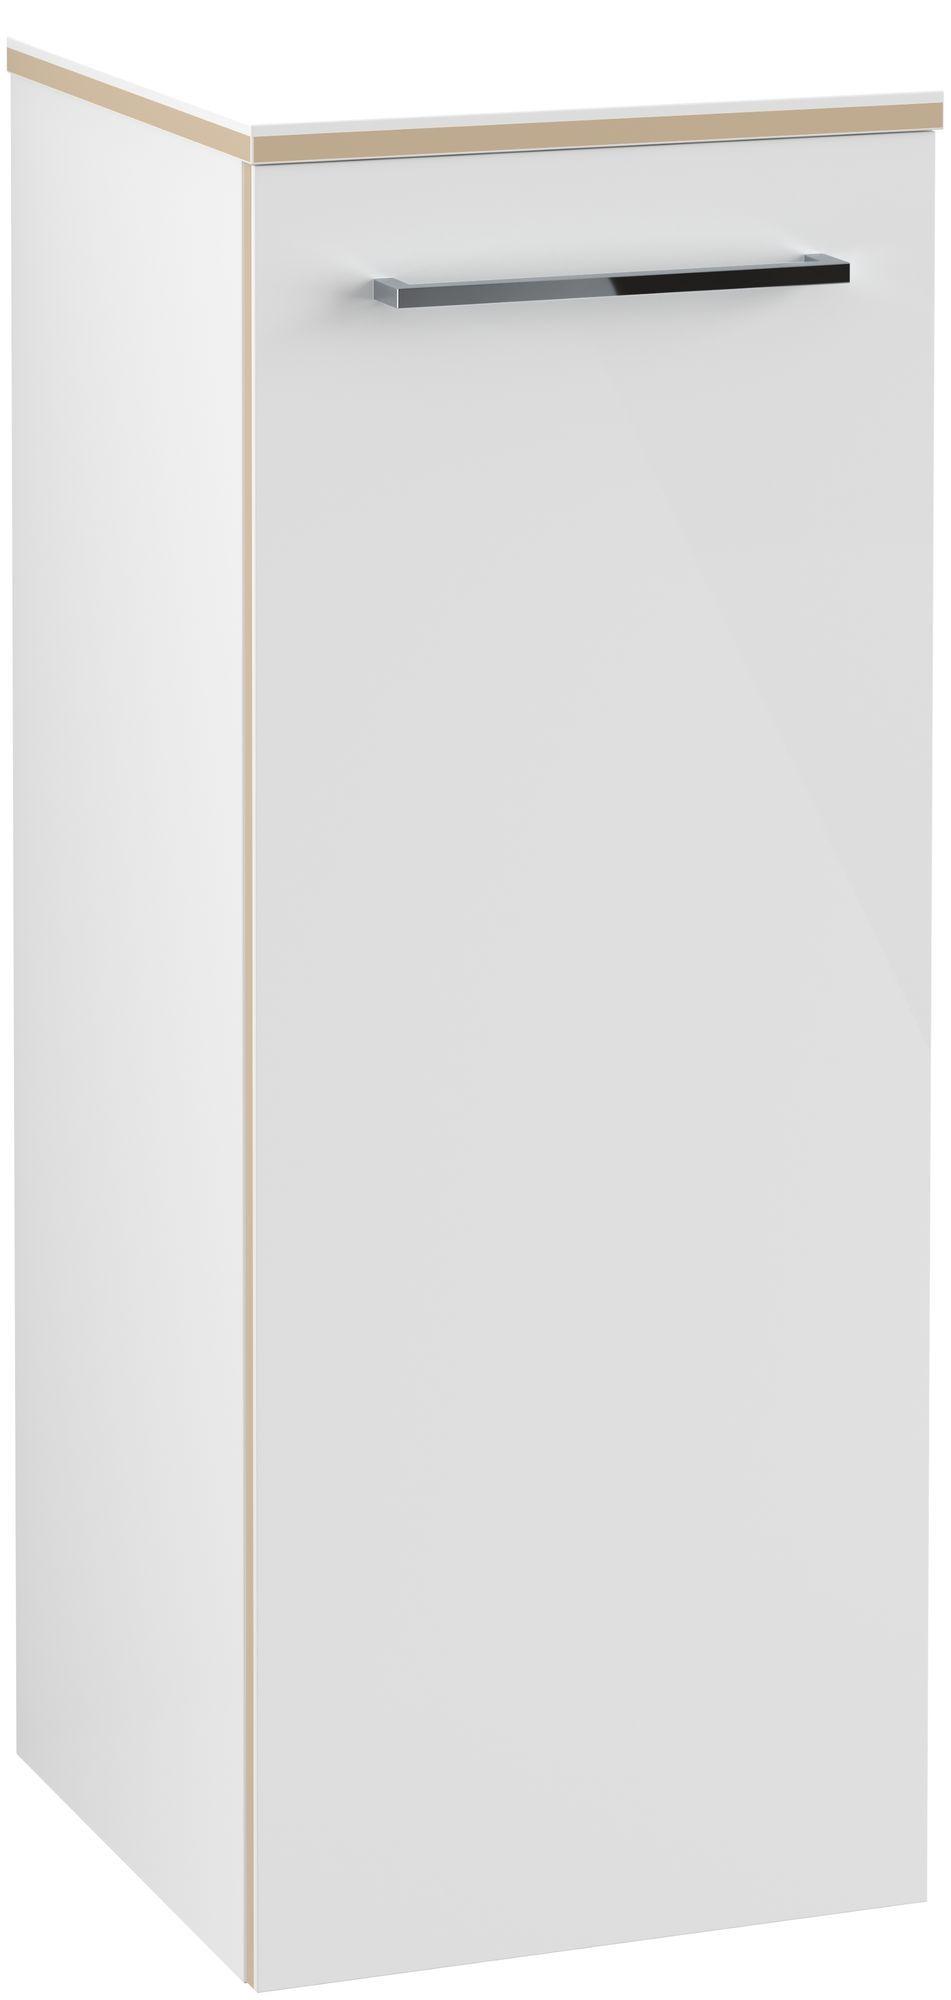 Villeroy & Boch Avento Seitenschrank Türanschlag links B:35 x H:89,2 x T:37 cm crystal white A89500B4